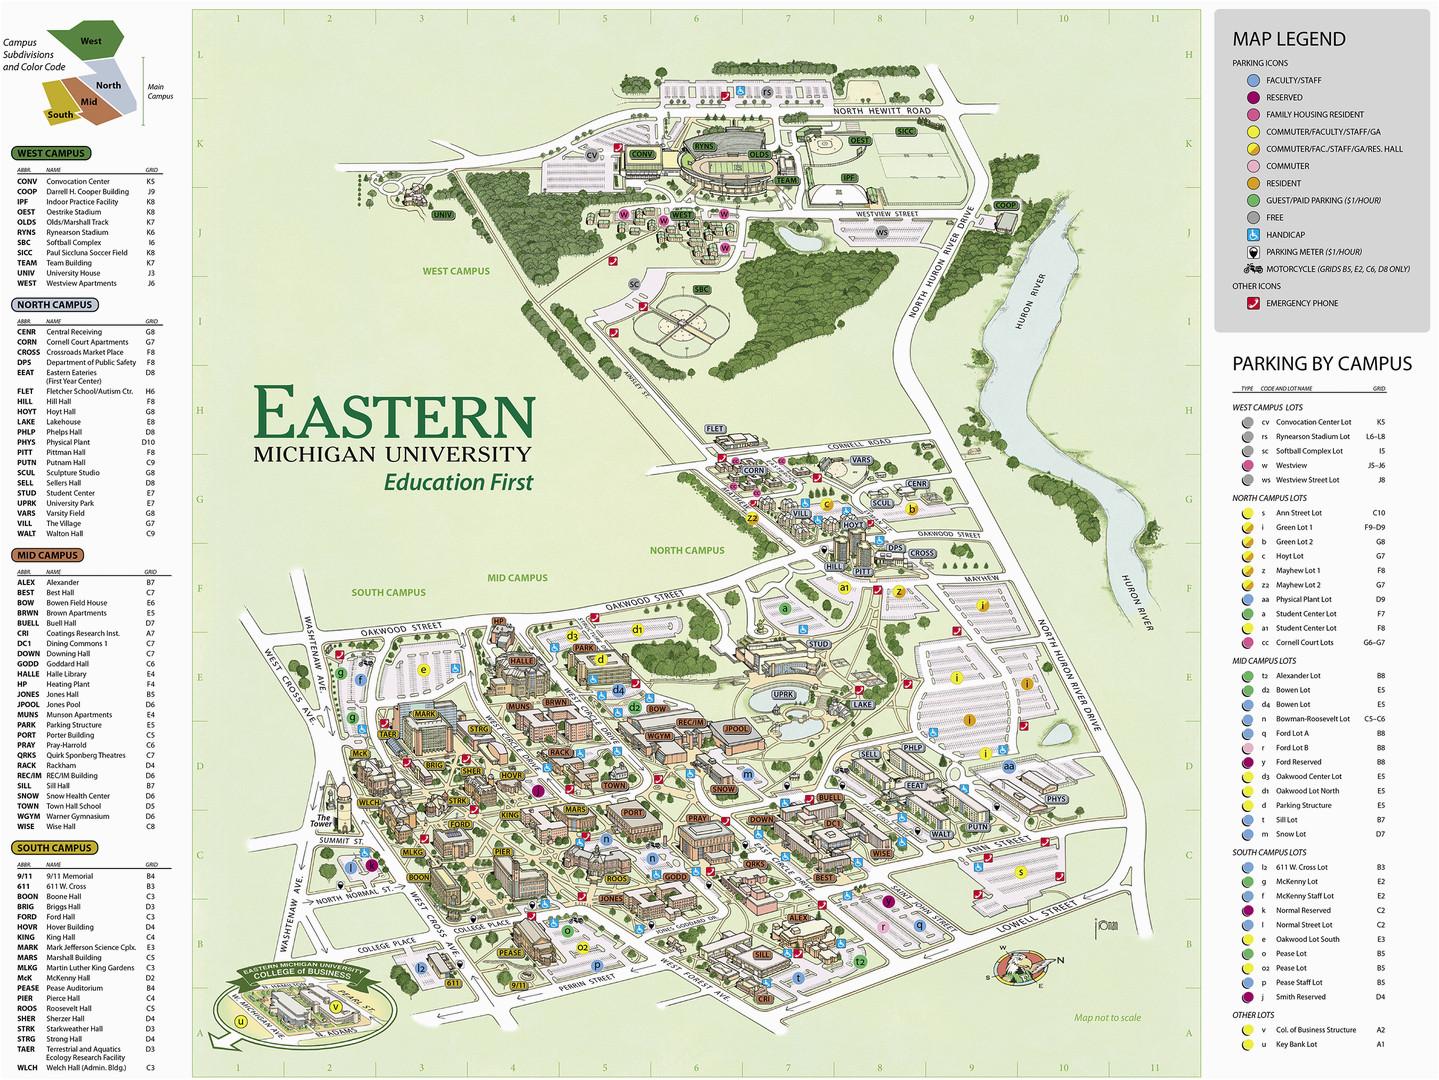 Georgia Southern University Map Georgia southern University Campus Map Georgia southern Campus Map